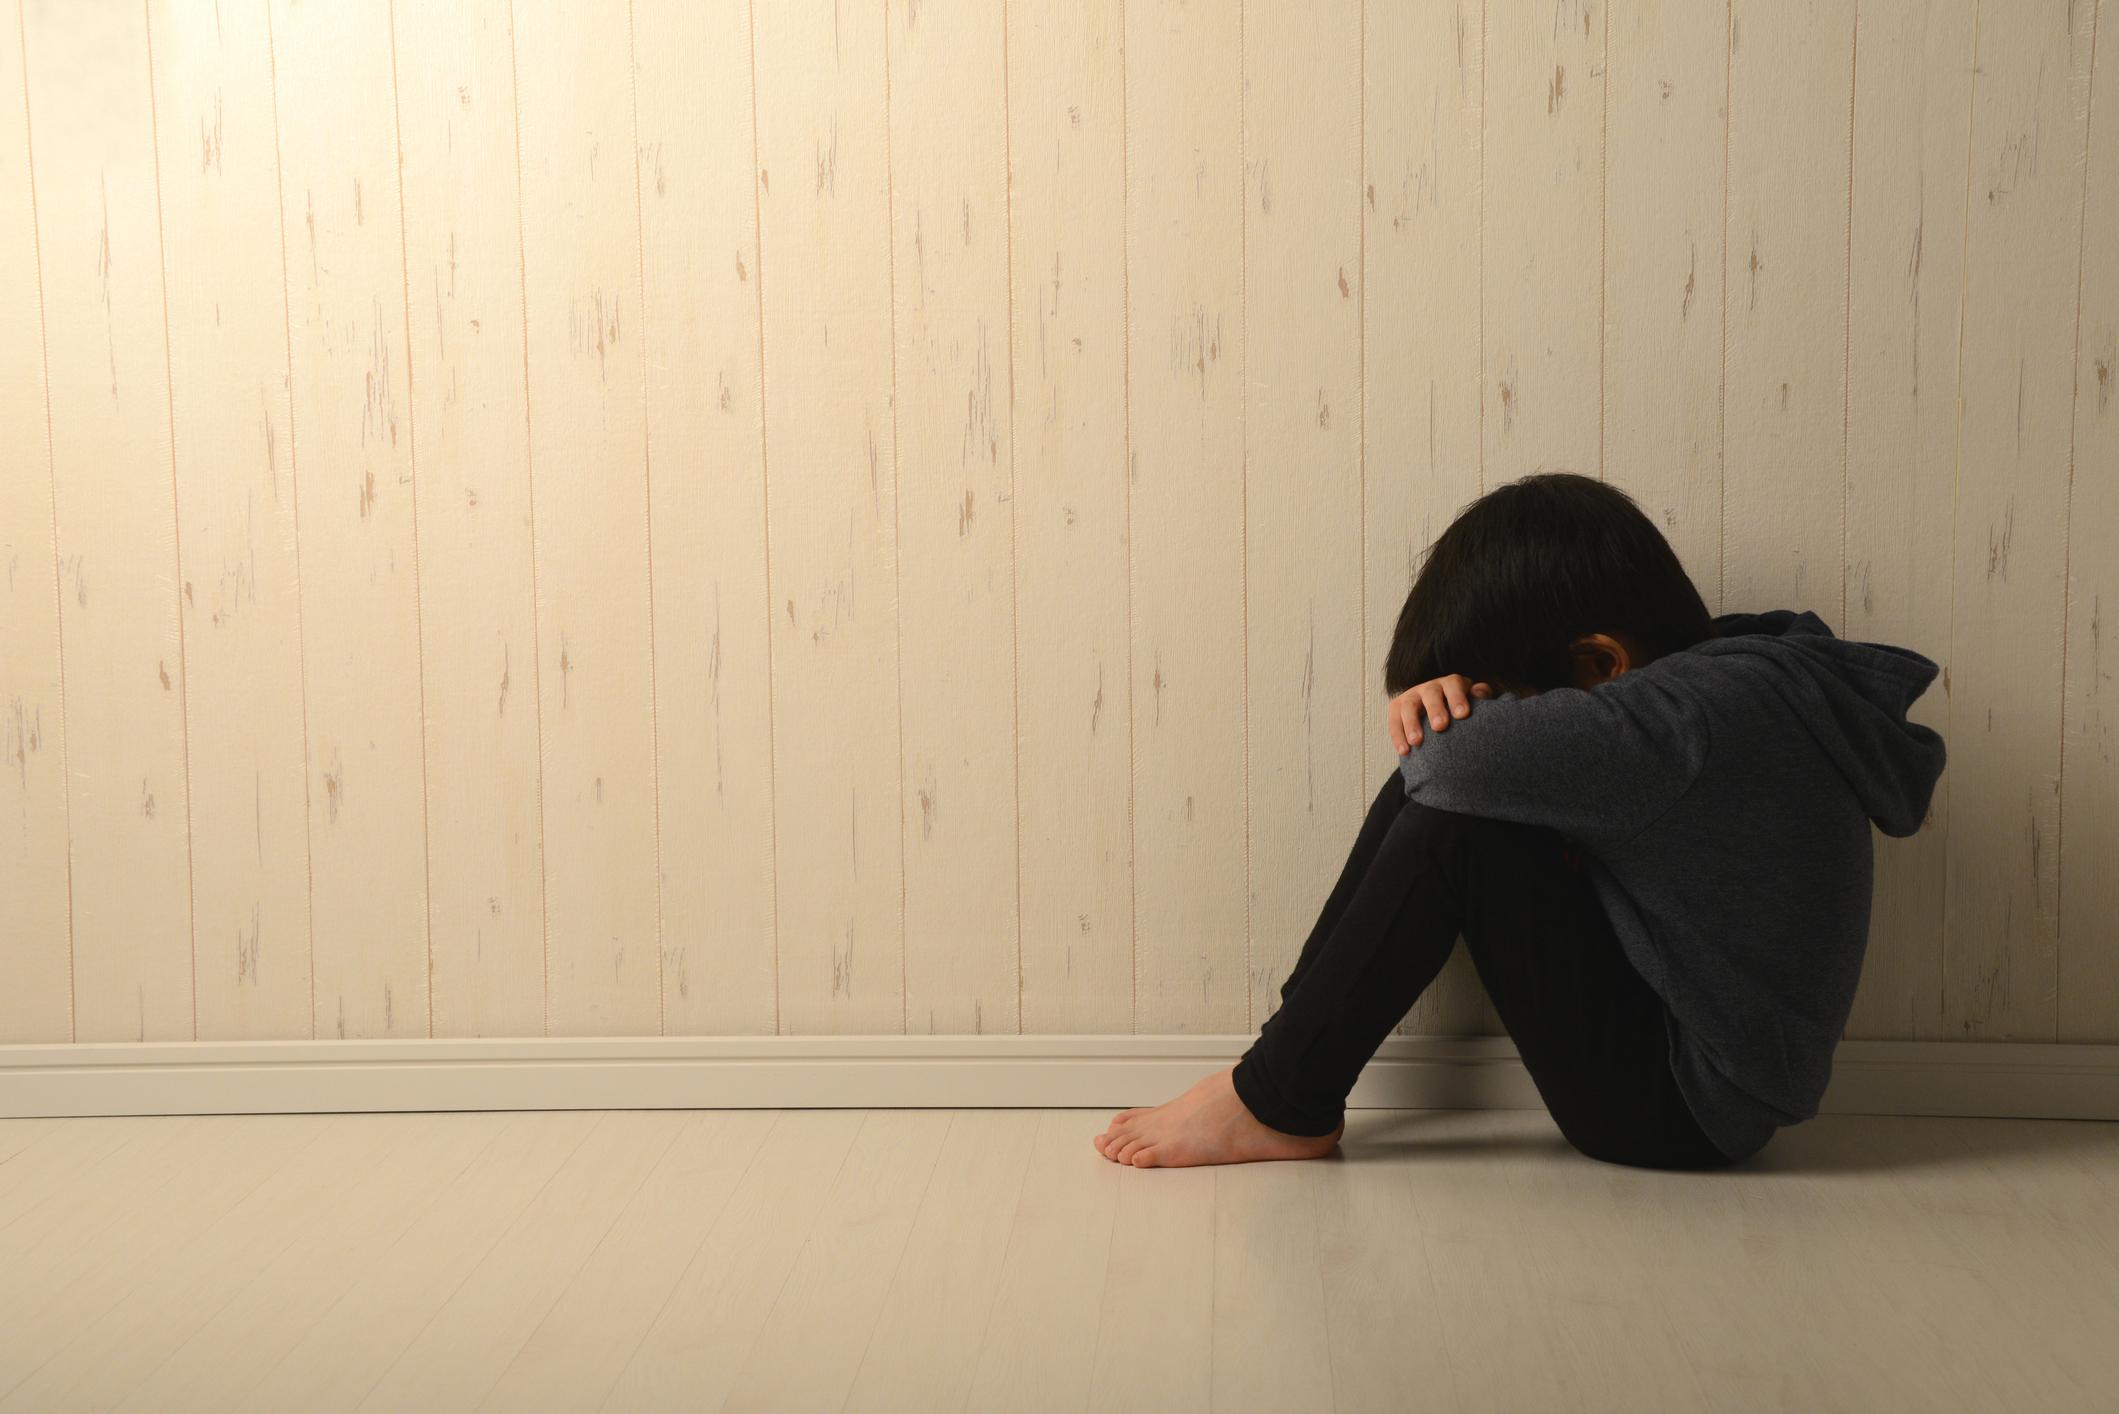 Suffering child in dark room - stock photo